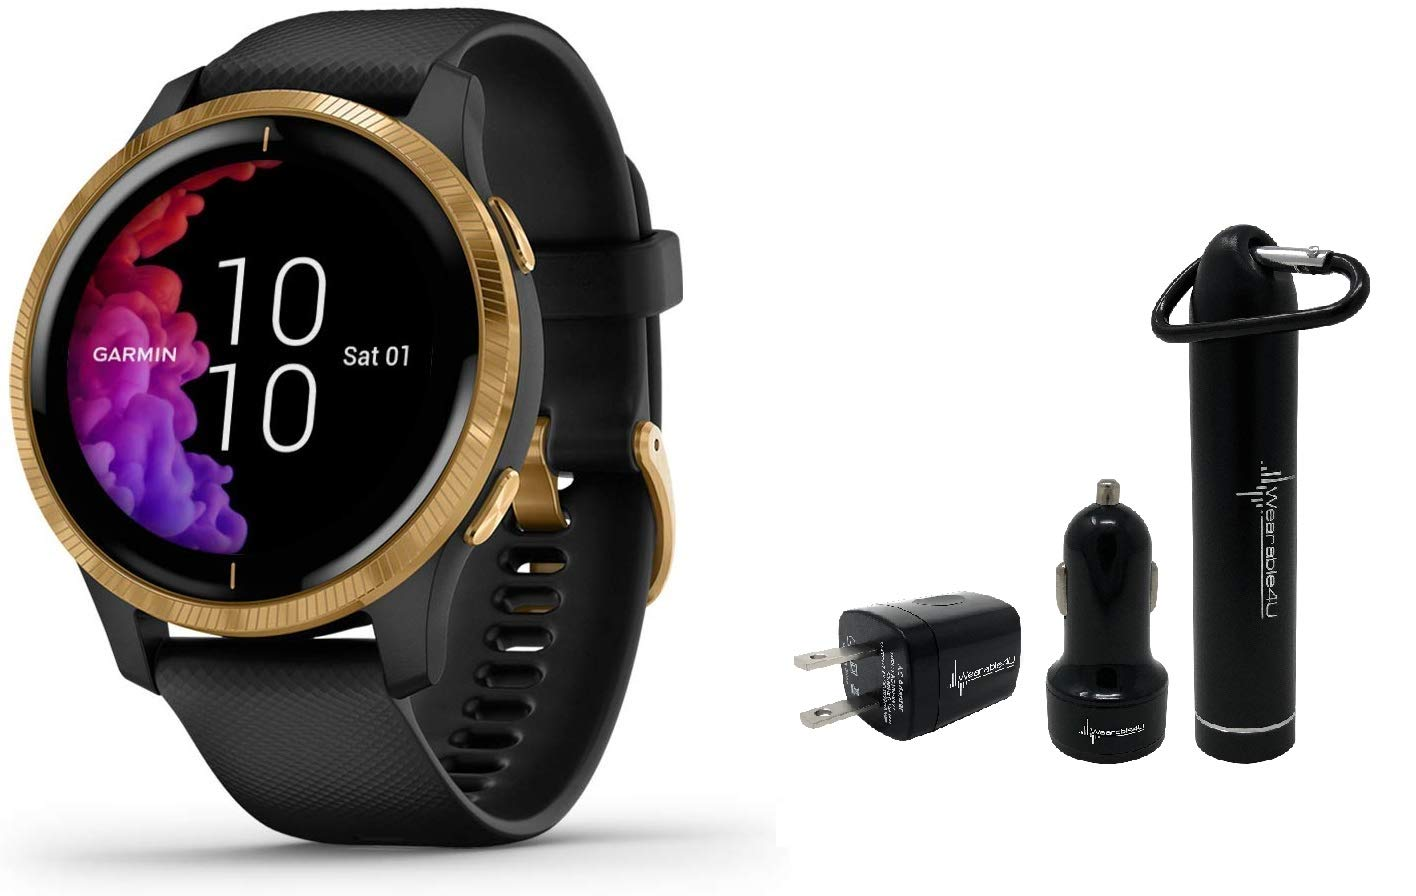 Garmin Venu GPS Smartwatch with AMOLED Display and Wearable4U Power Pack Bundle (Black/Gold)